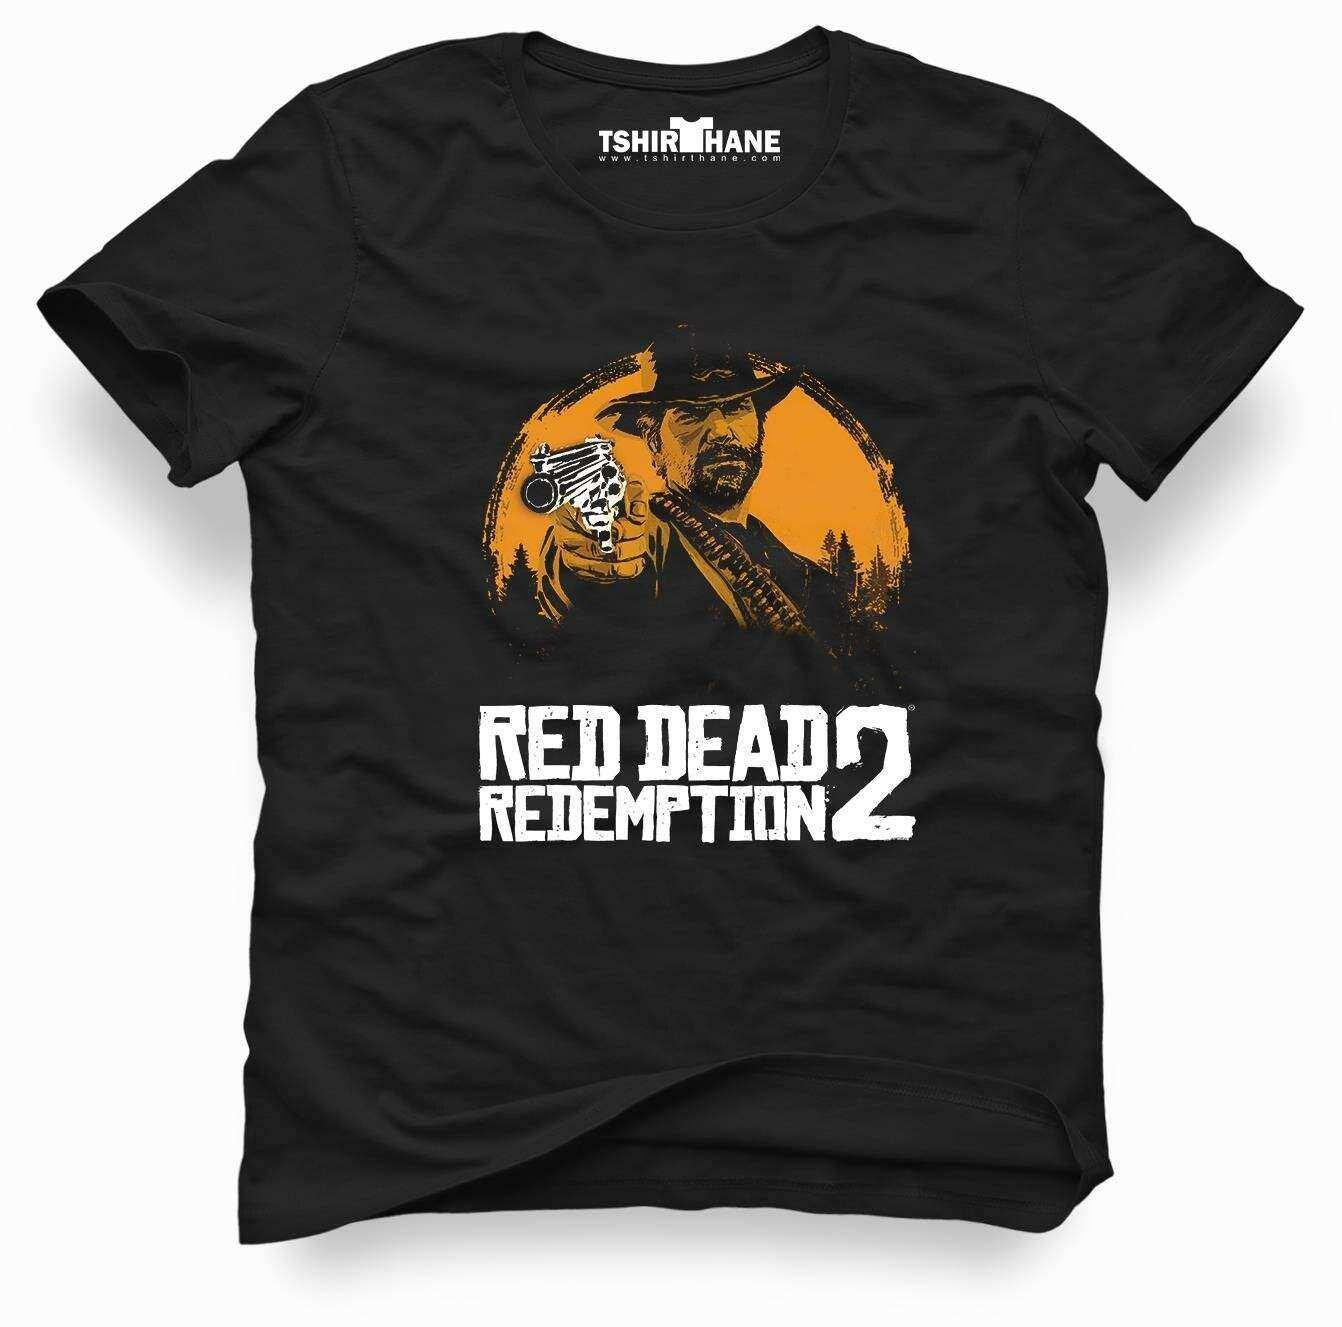 Tshirthane Red Dead Redemption 2 Tişört Erkek Tshirt